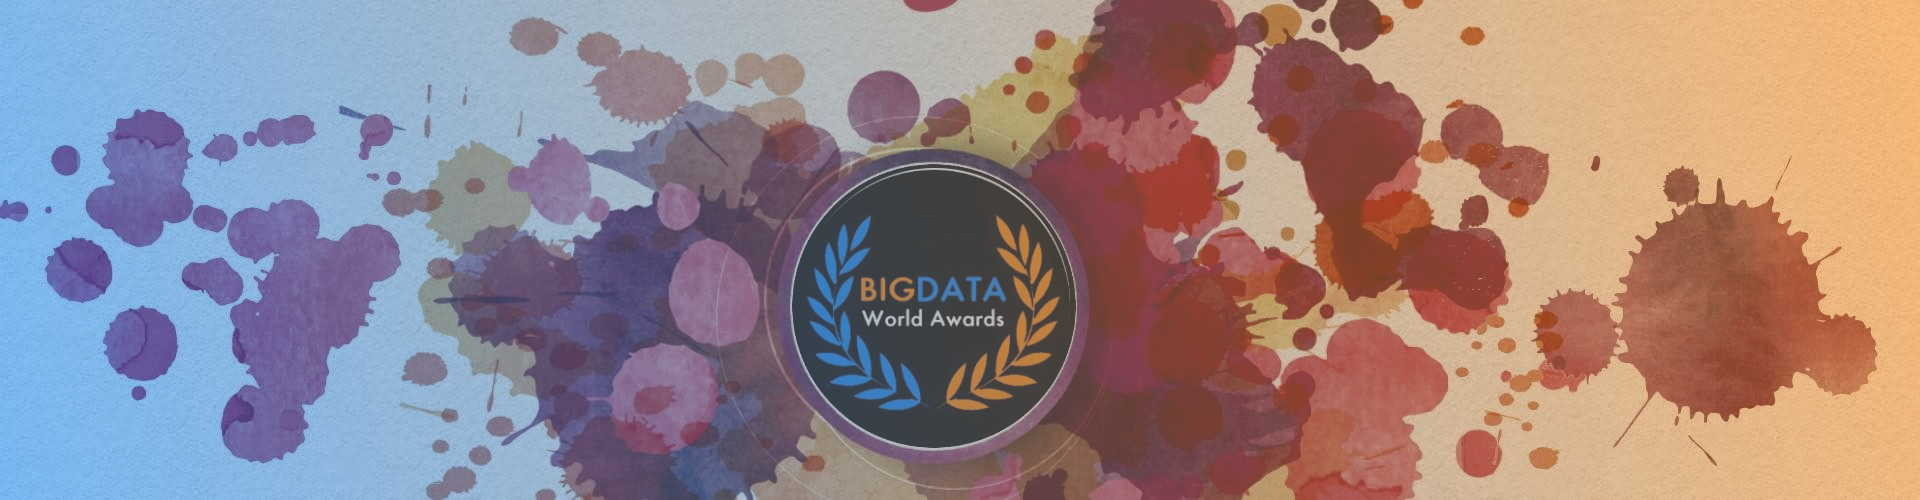 BIG DATA WORLD AWARDS